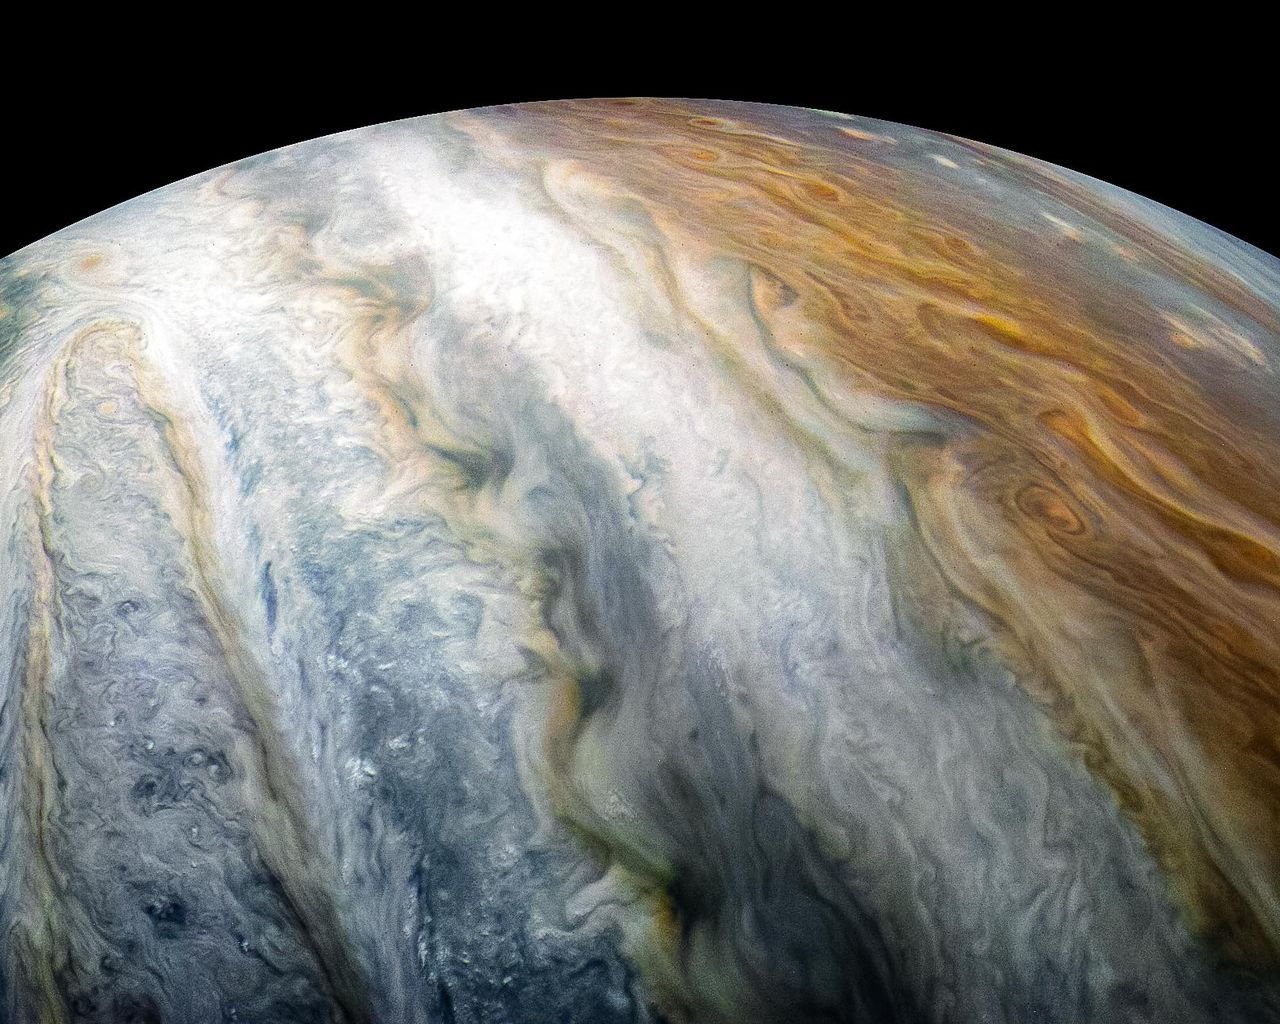 Jupiter Southern Hemisphere Cloud Belt Swirls